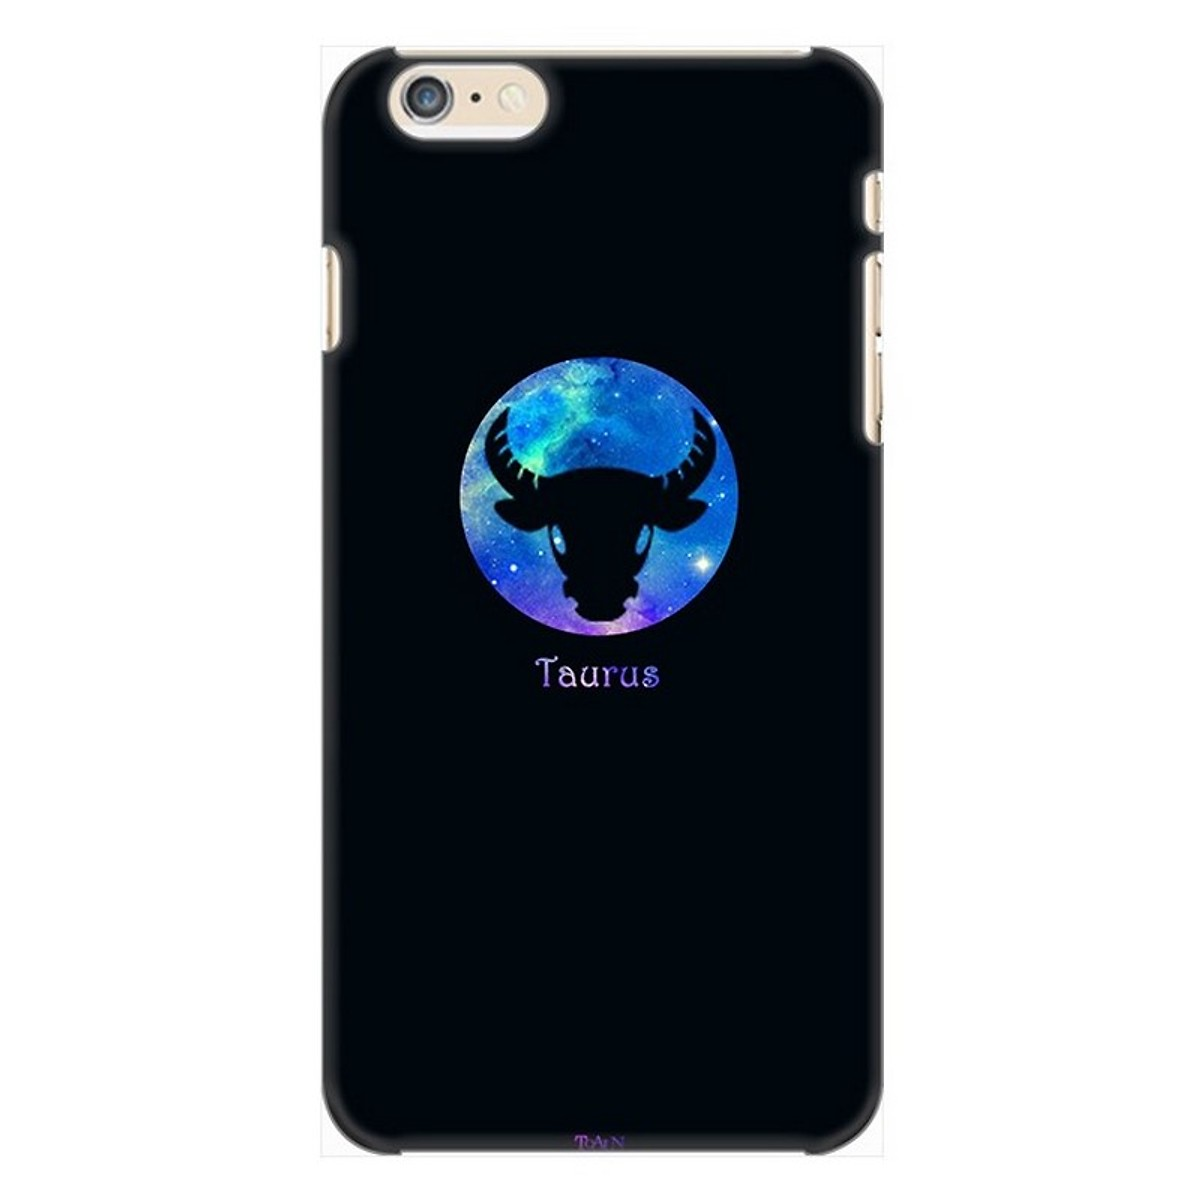 Ốp Lưng Cho iPhone 6 Plus - Mẫu 92